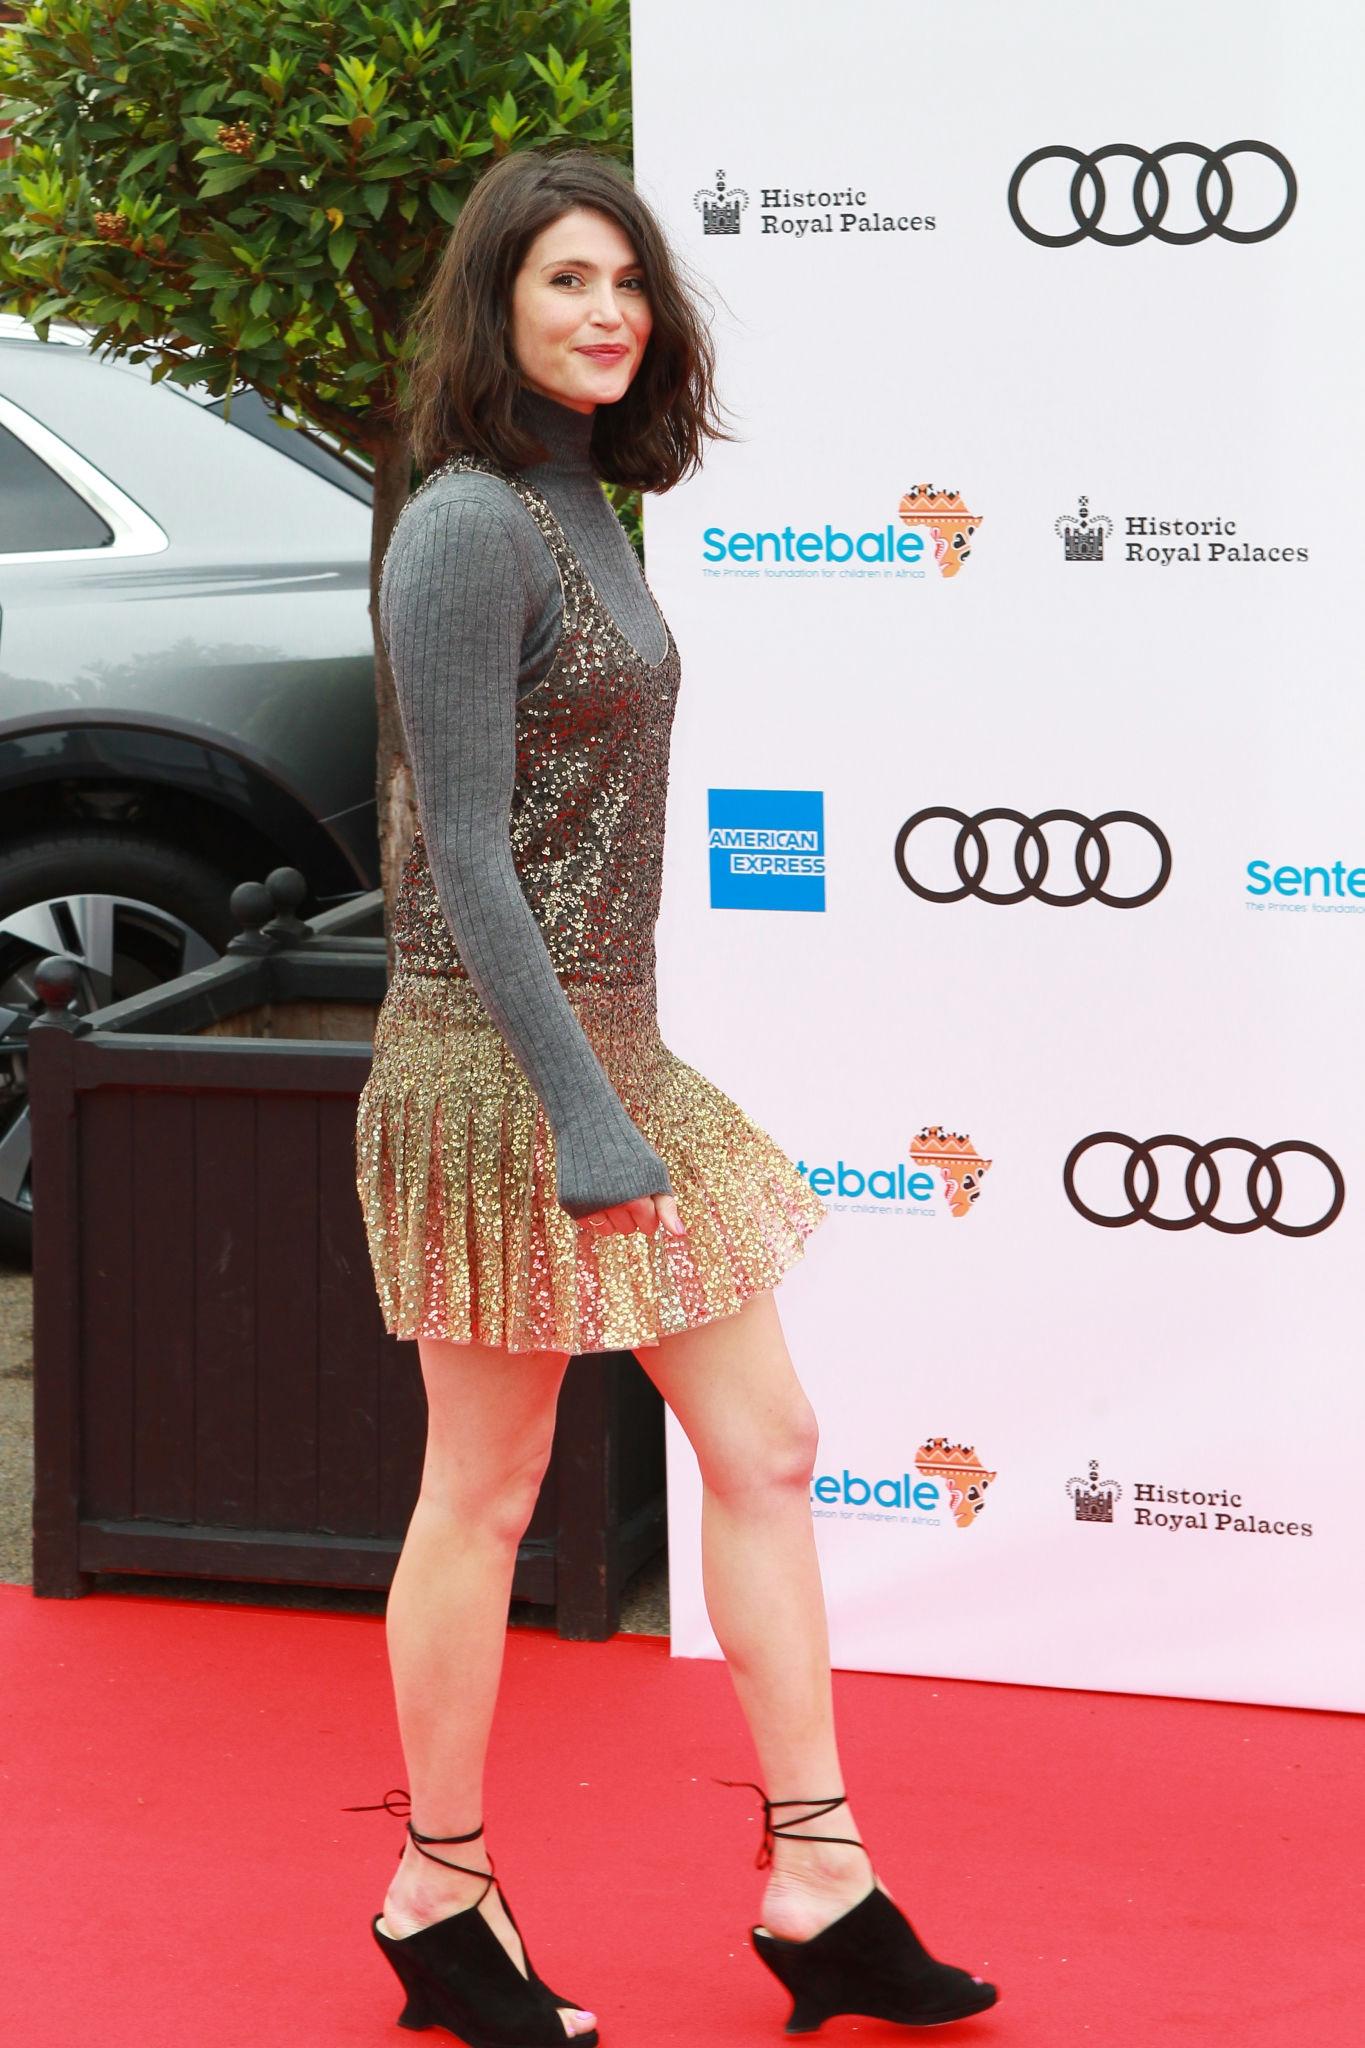 Gemma Arterton 2019 : Gemma Arterton: Red Carpet at Audi Sentebale Concert in London-07